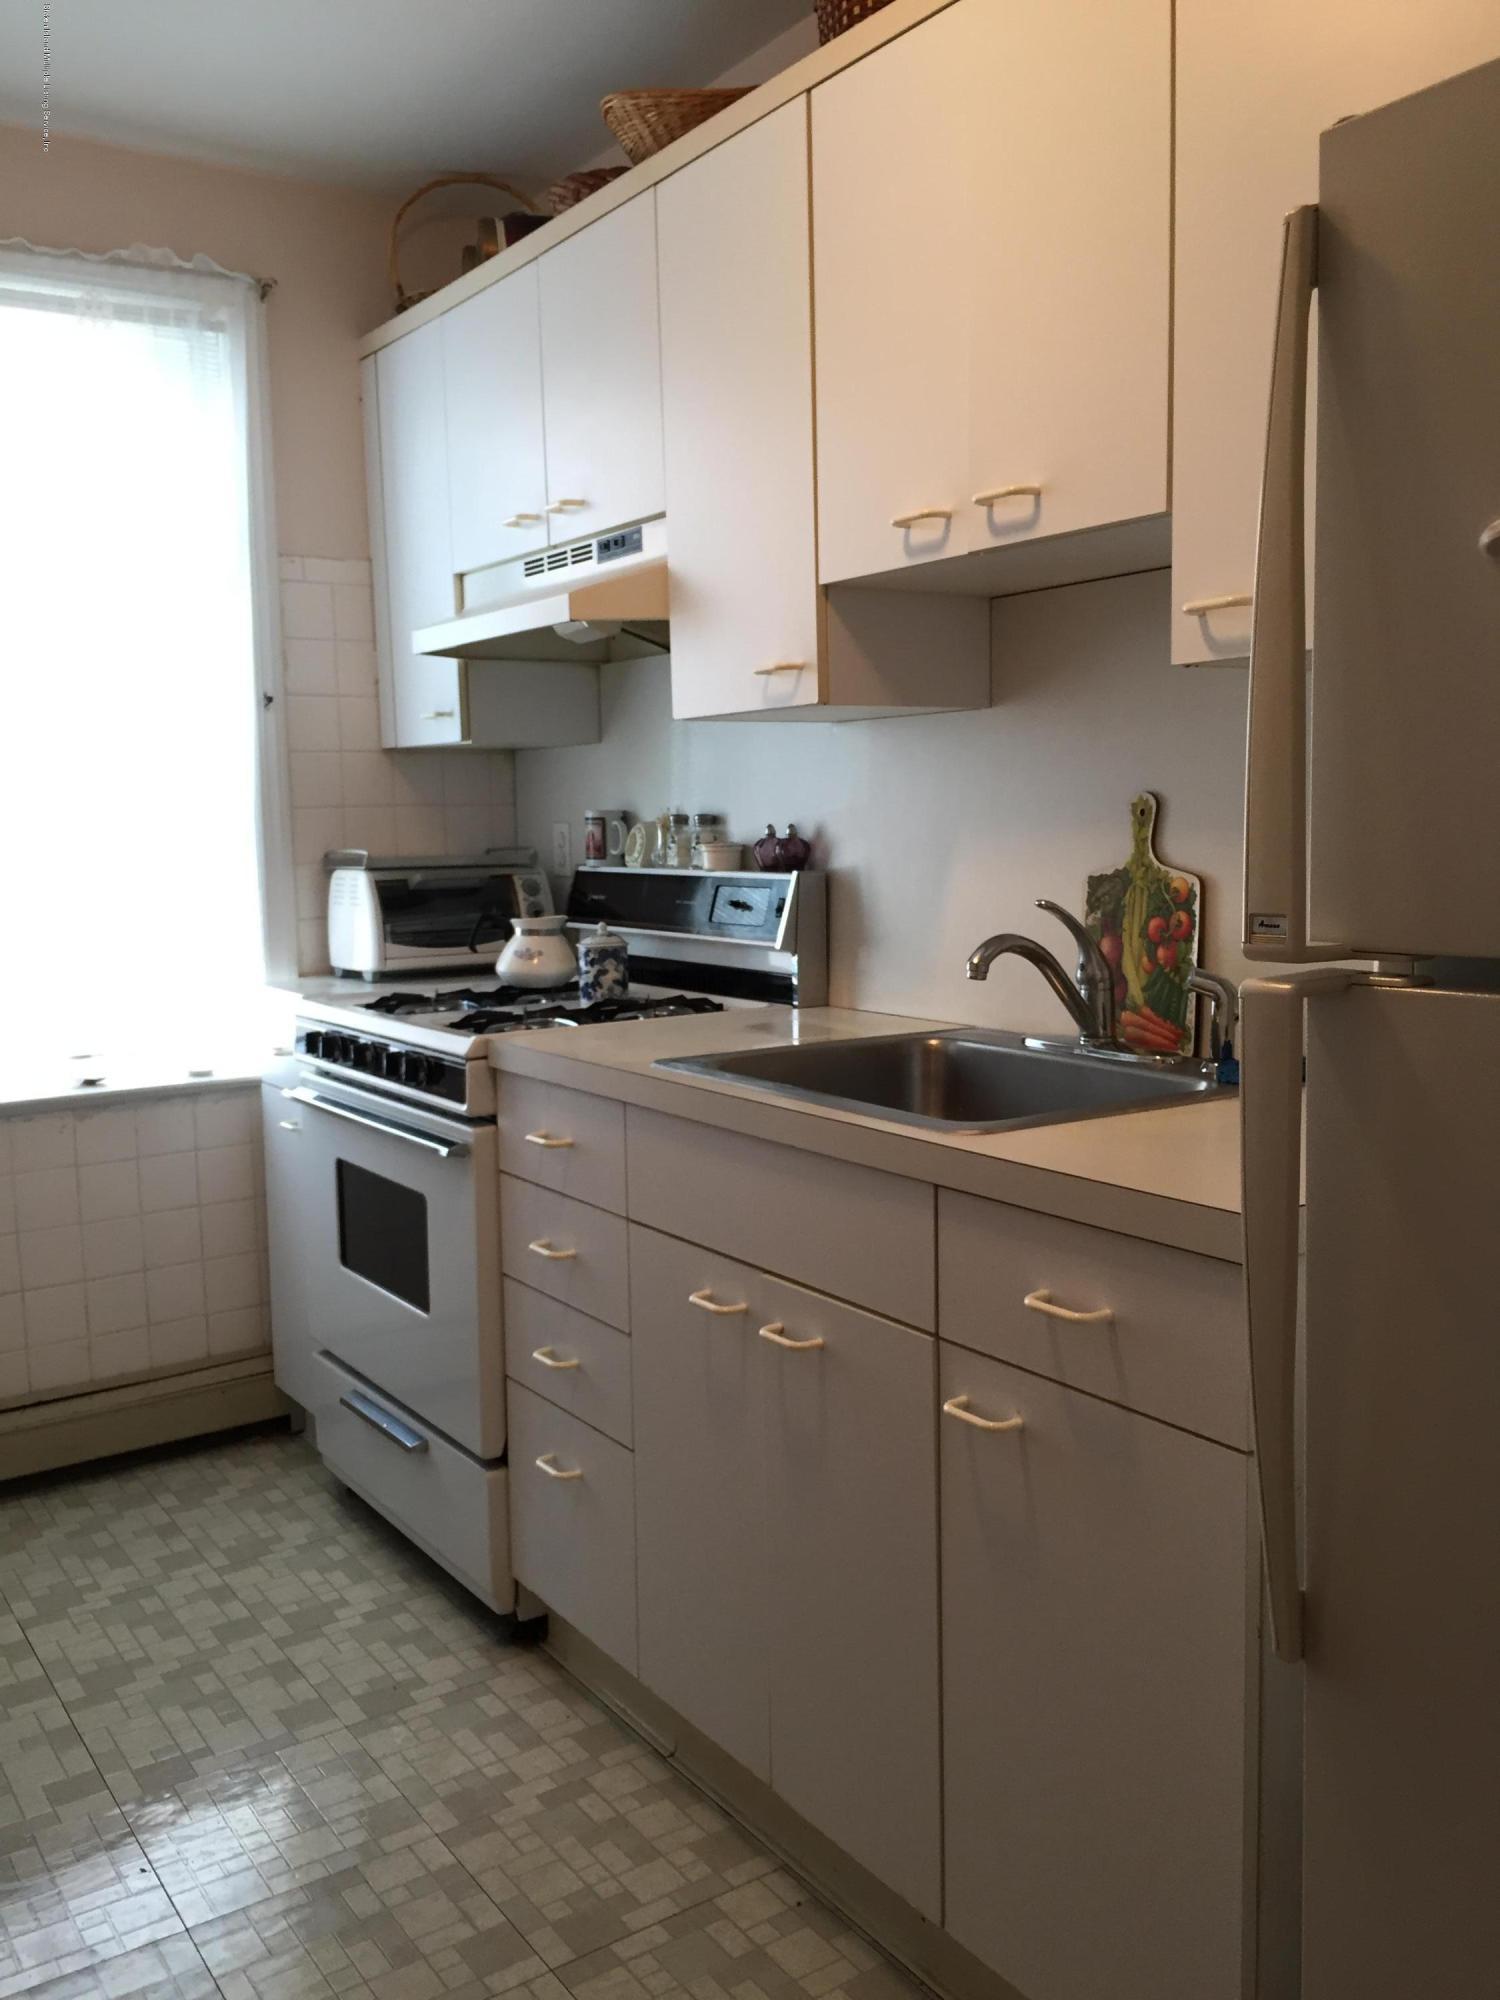 Two Family - Semi-Attached 31 Coale Avenue  Staten Island, NY 10314, MLS-1123386-9